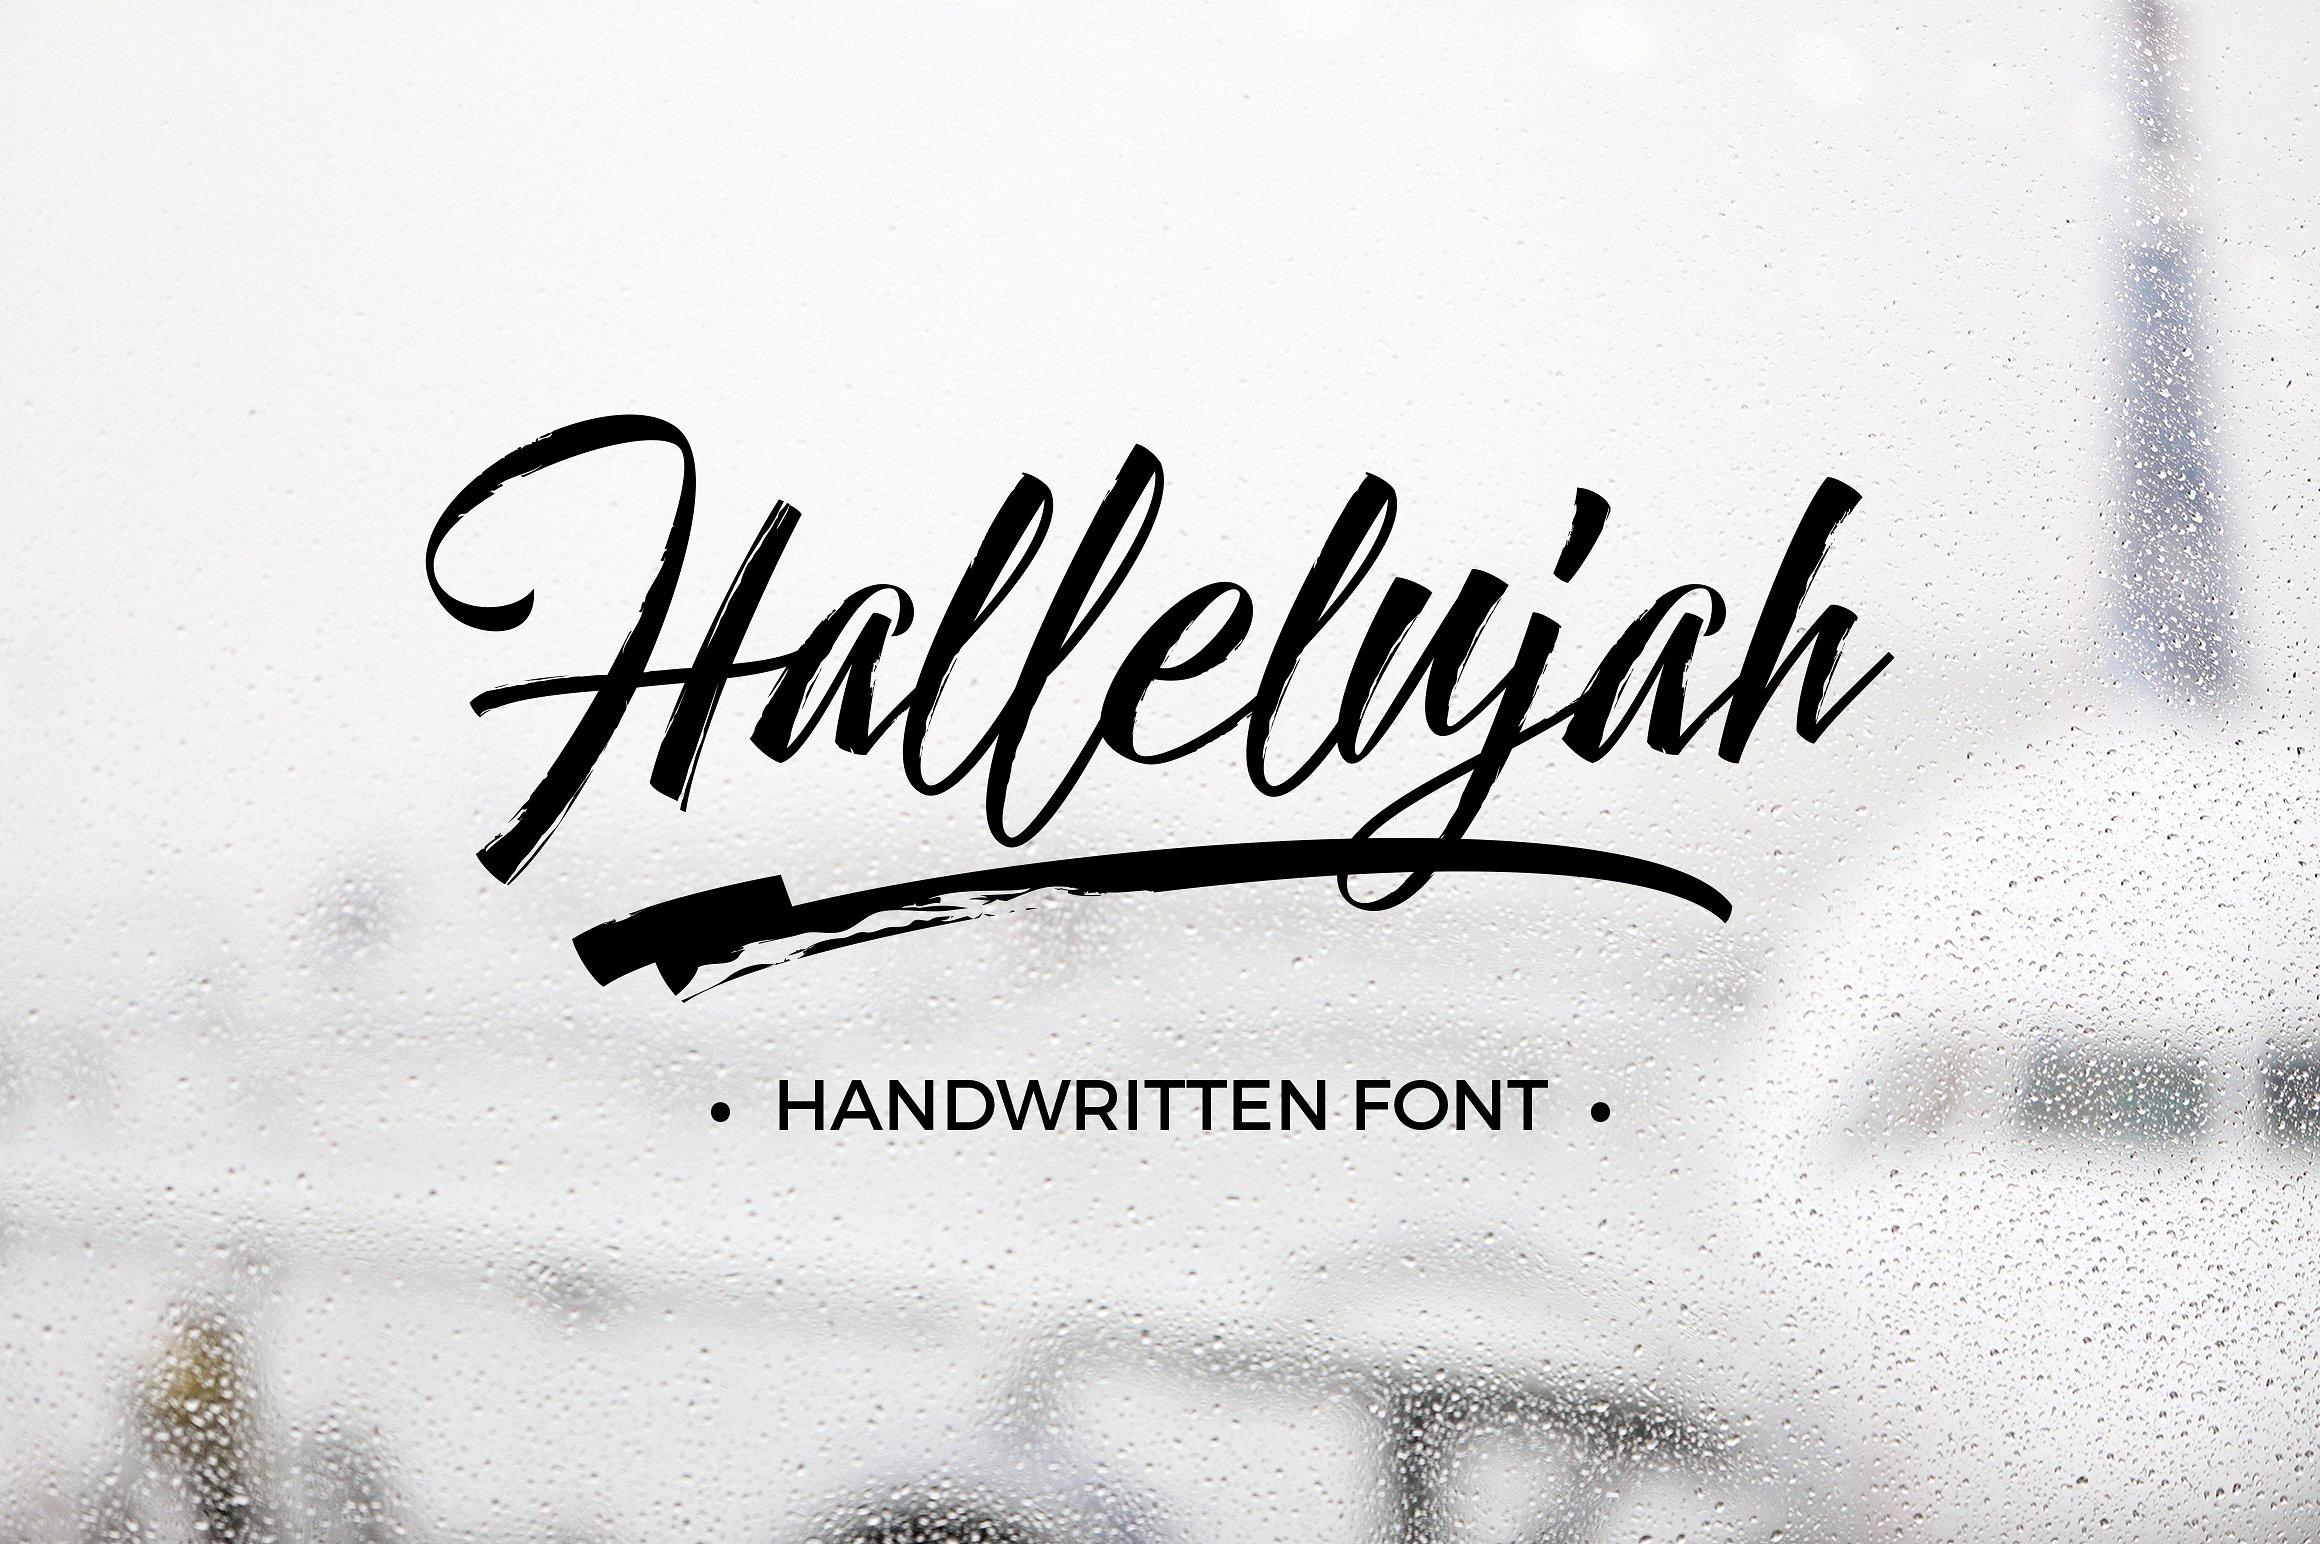 Hallelujah Script Free Font - Free Fonts